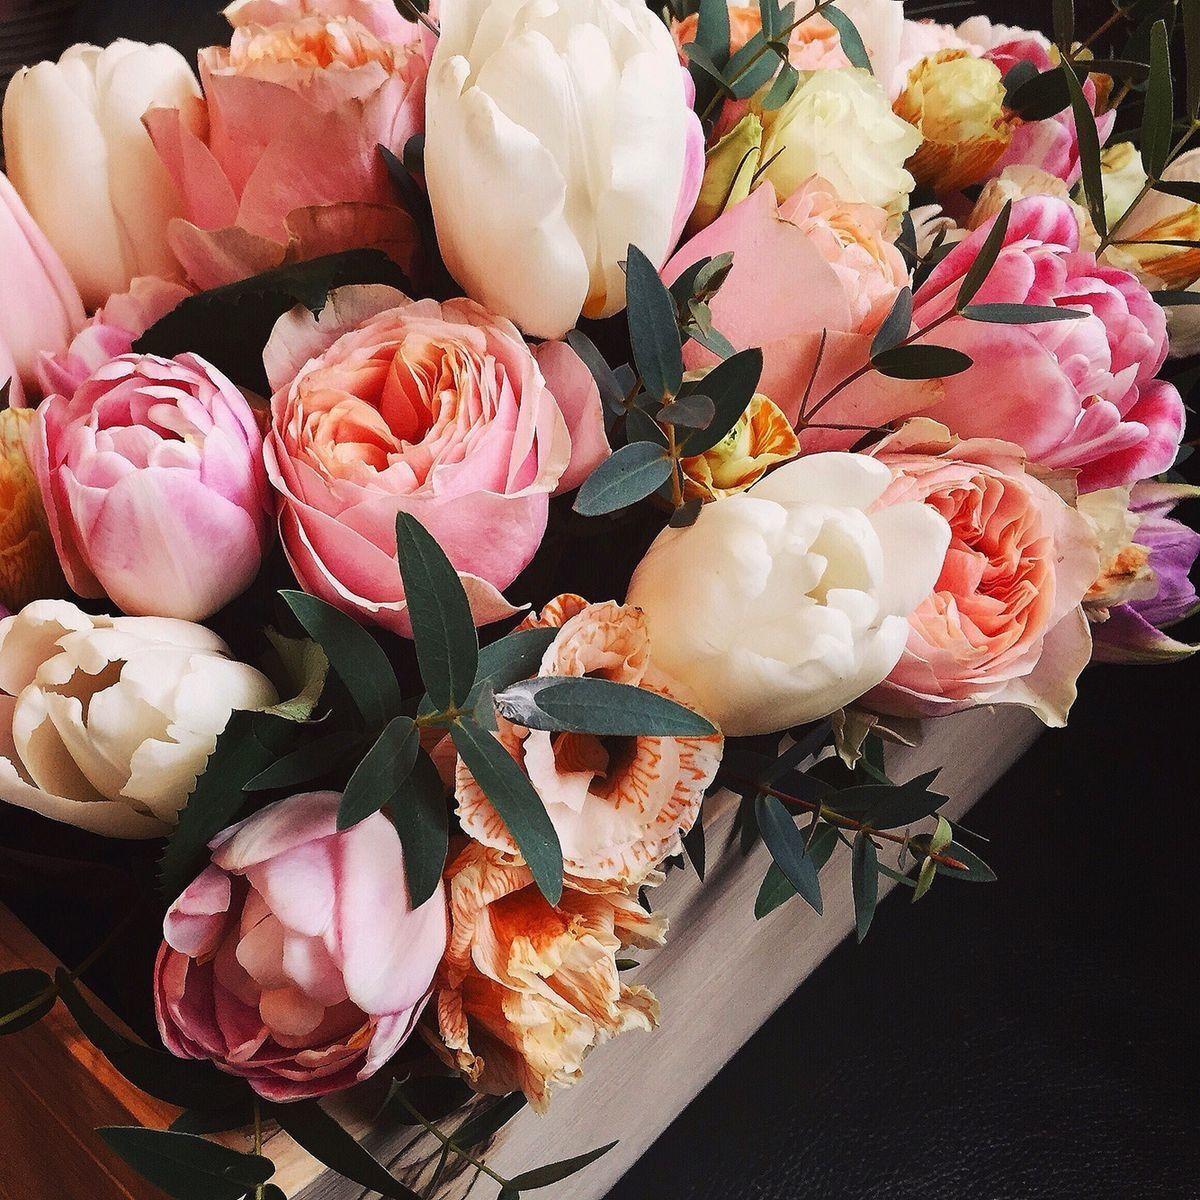 Pin By Makarova On Lyrics Pinterest Pretty Flowers Plants And